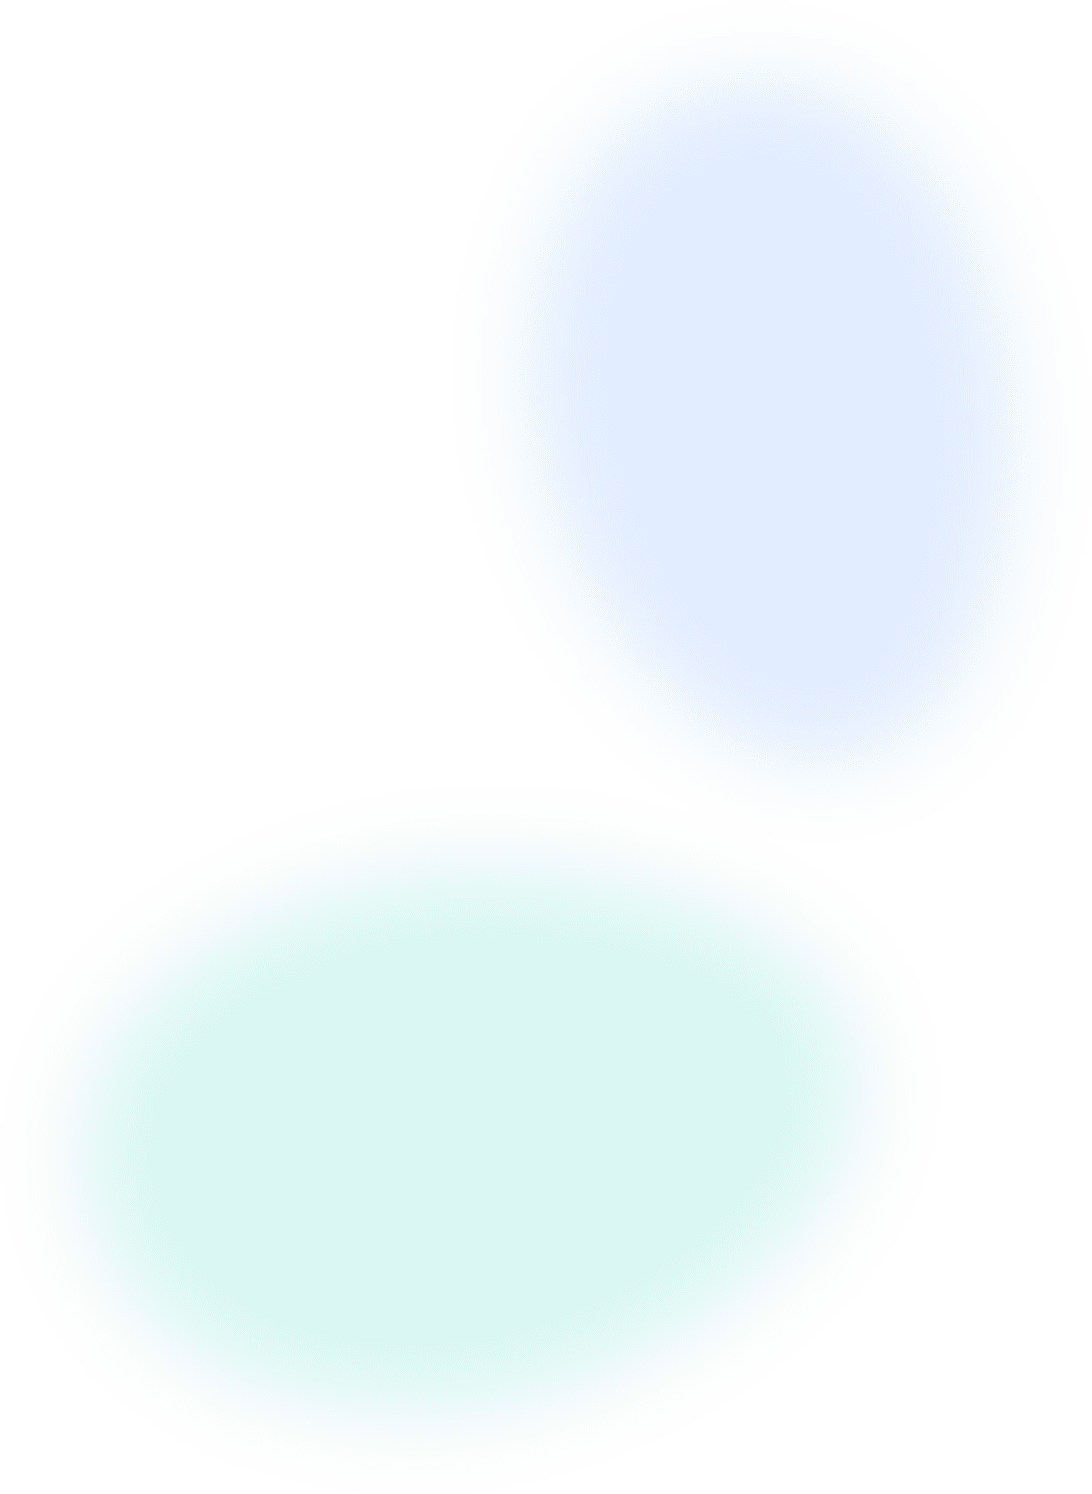 green-blue-bg